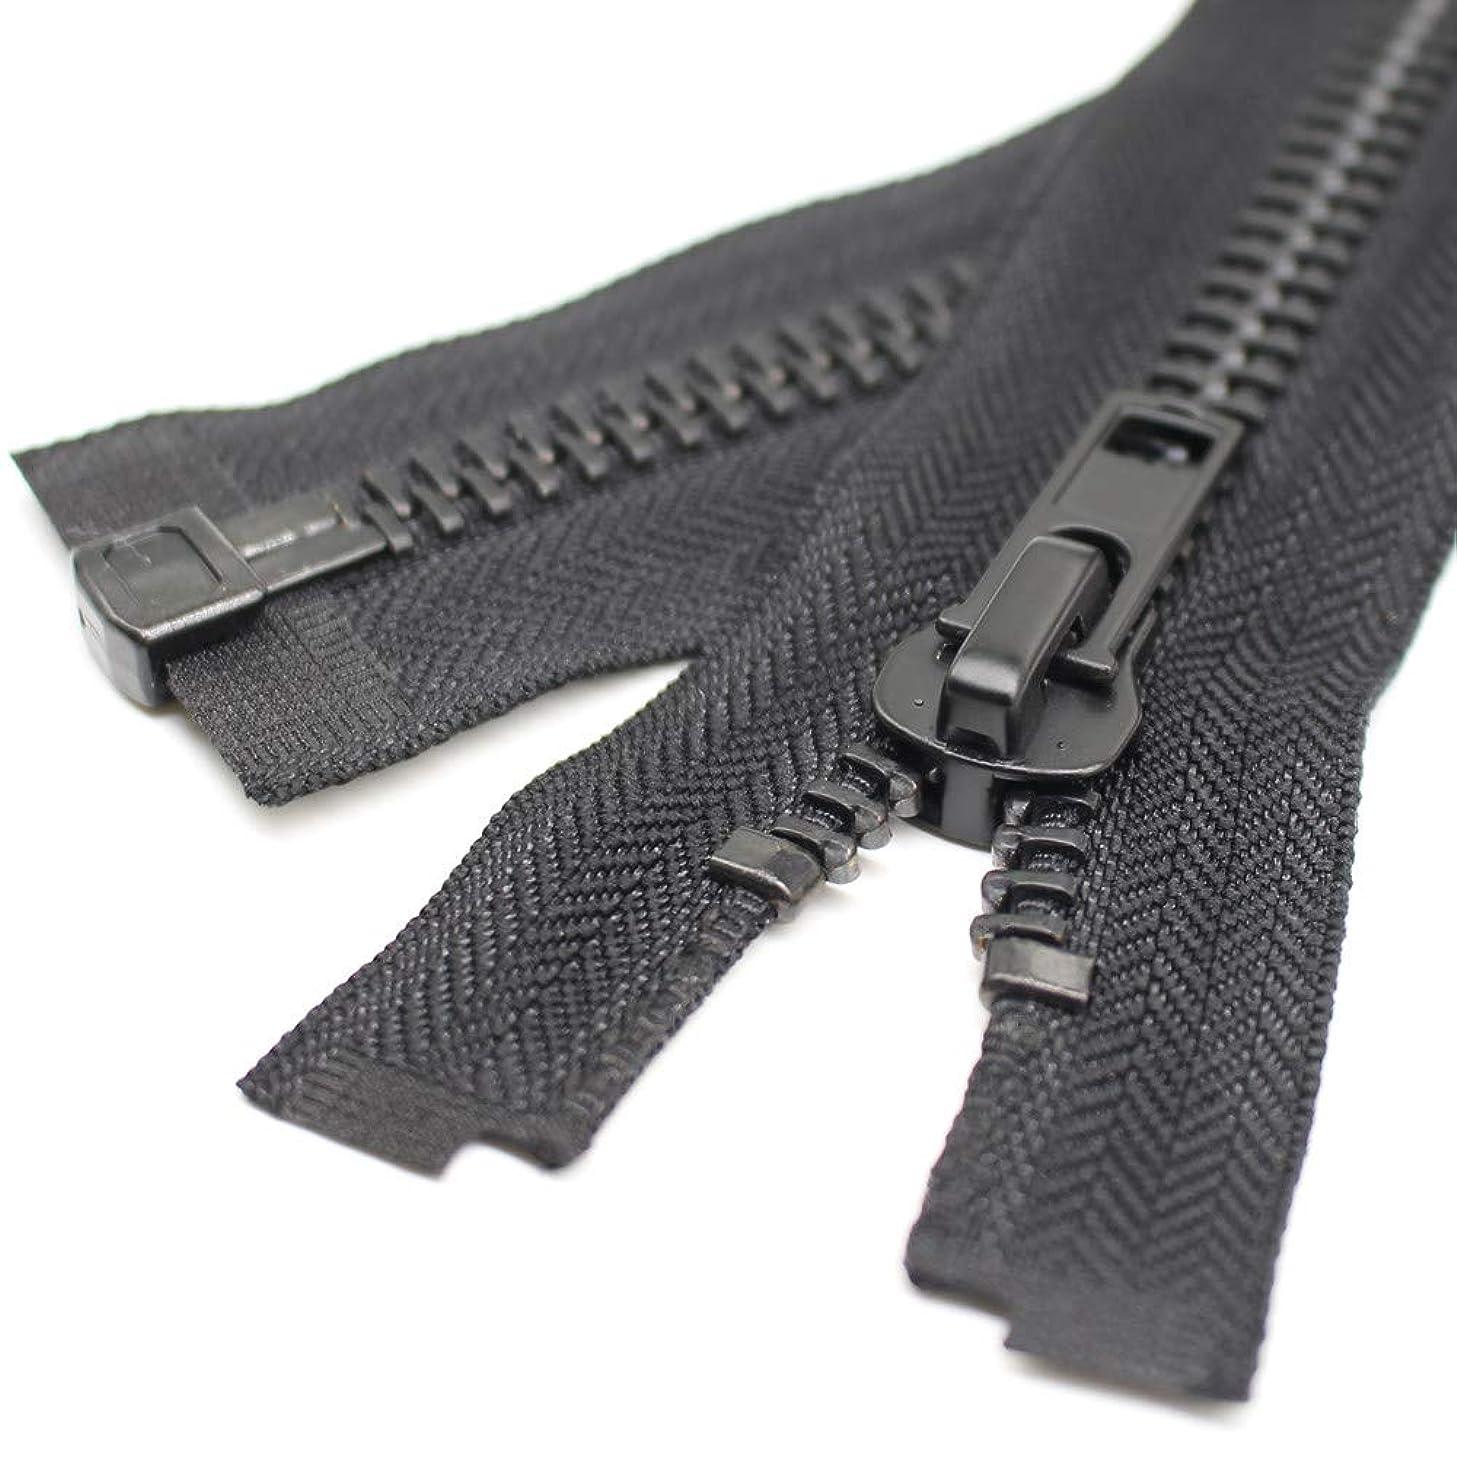 YaHoGa #10 30 Inch Black Nickel Separating Jacket Zipper Y-Teeth Metal Zipper Heavy Duty Metal Zippers for Jackets Sewing Coats Crafts (30